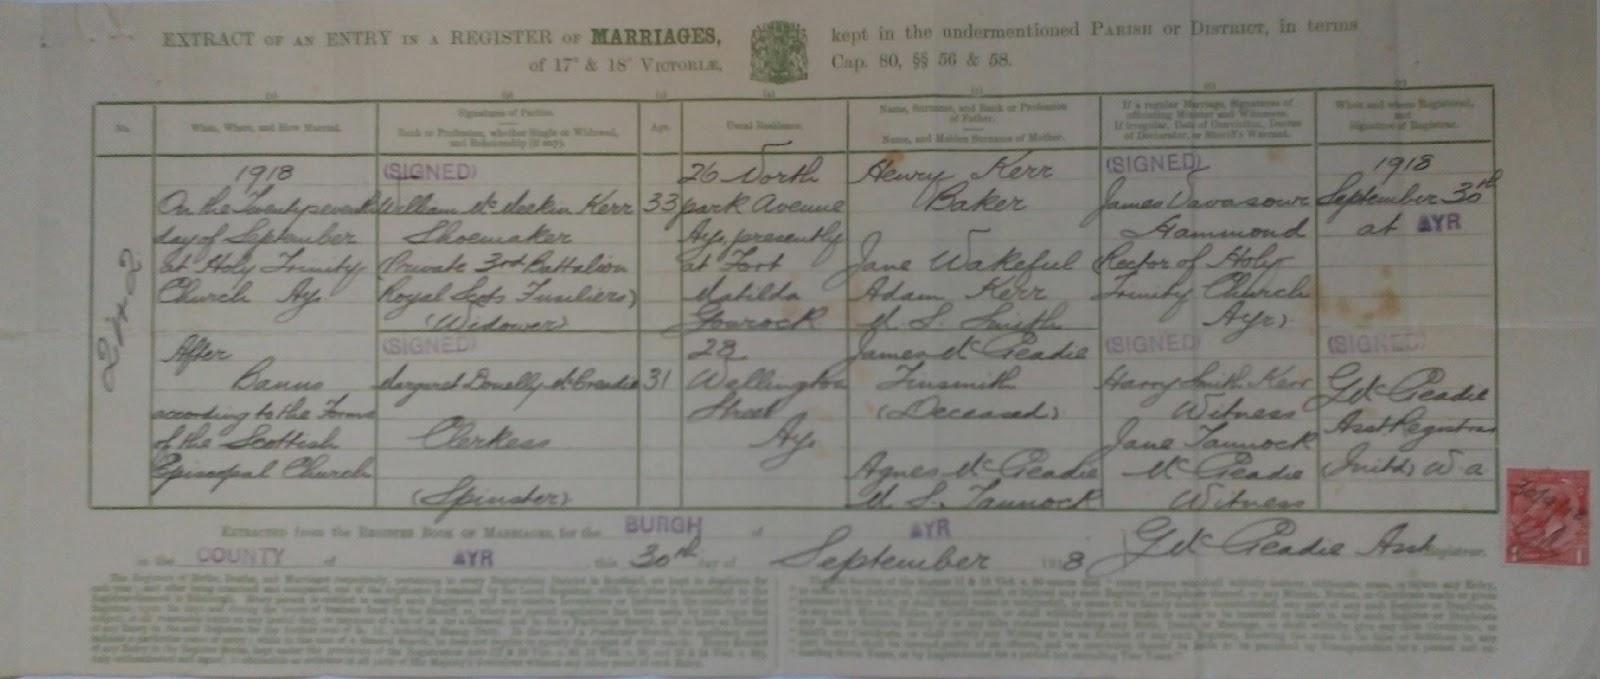 C:\Users\Main user\Pictures\Kerr Certificates\William Kerr and Margaret McCreadie Marriage Certificate.JPG